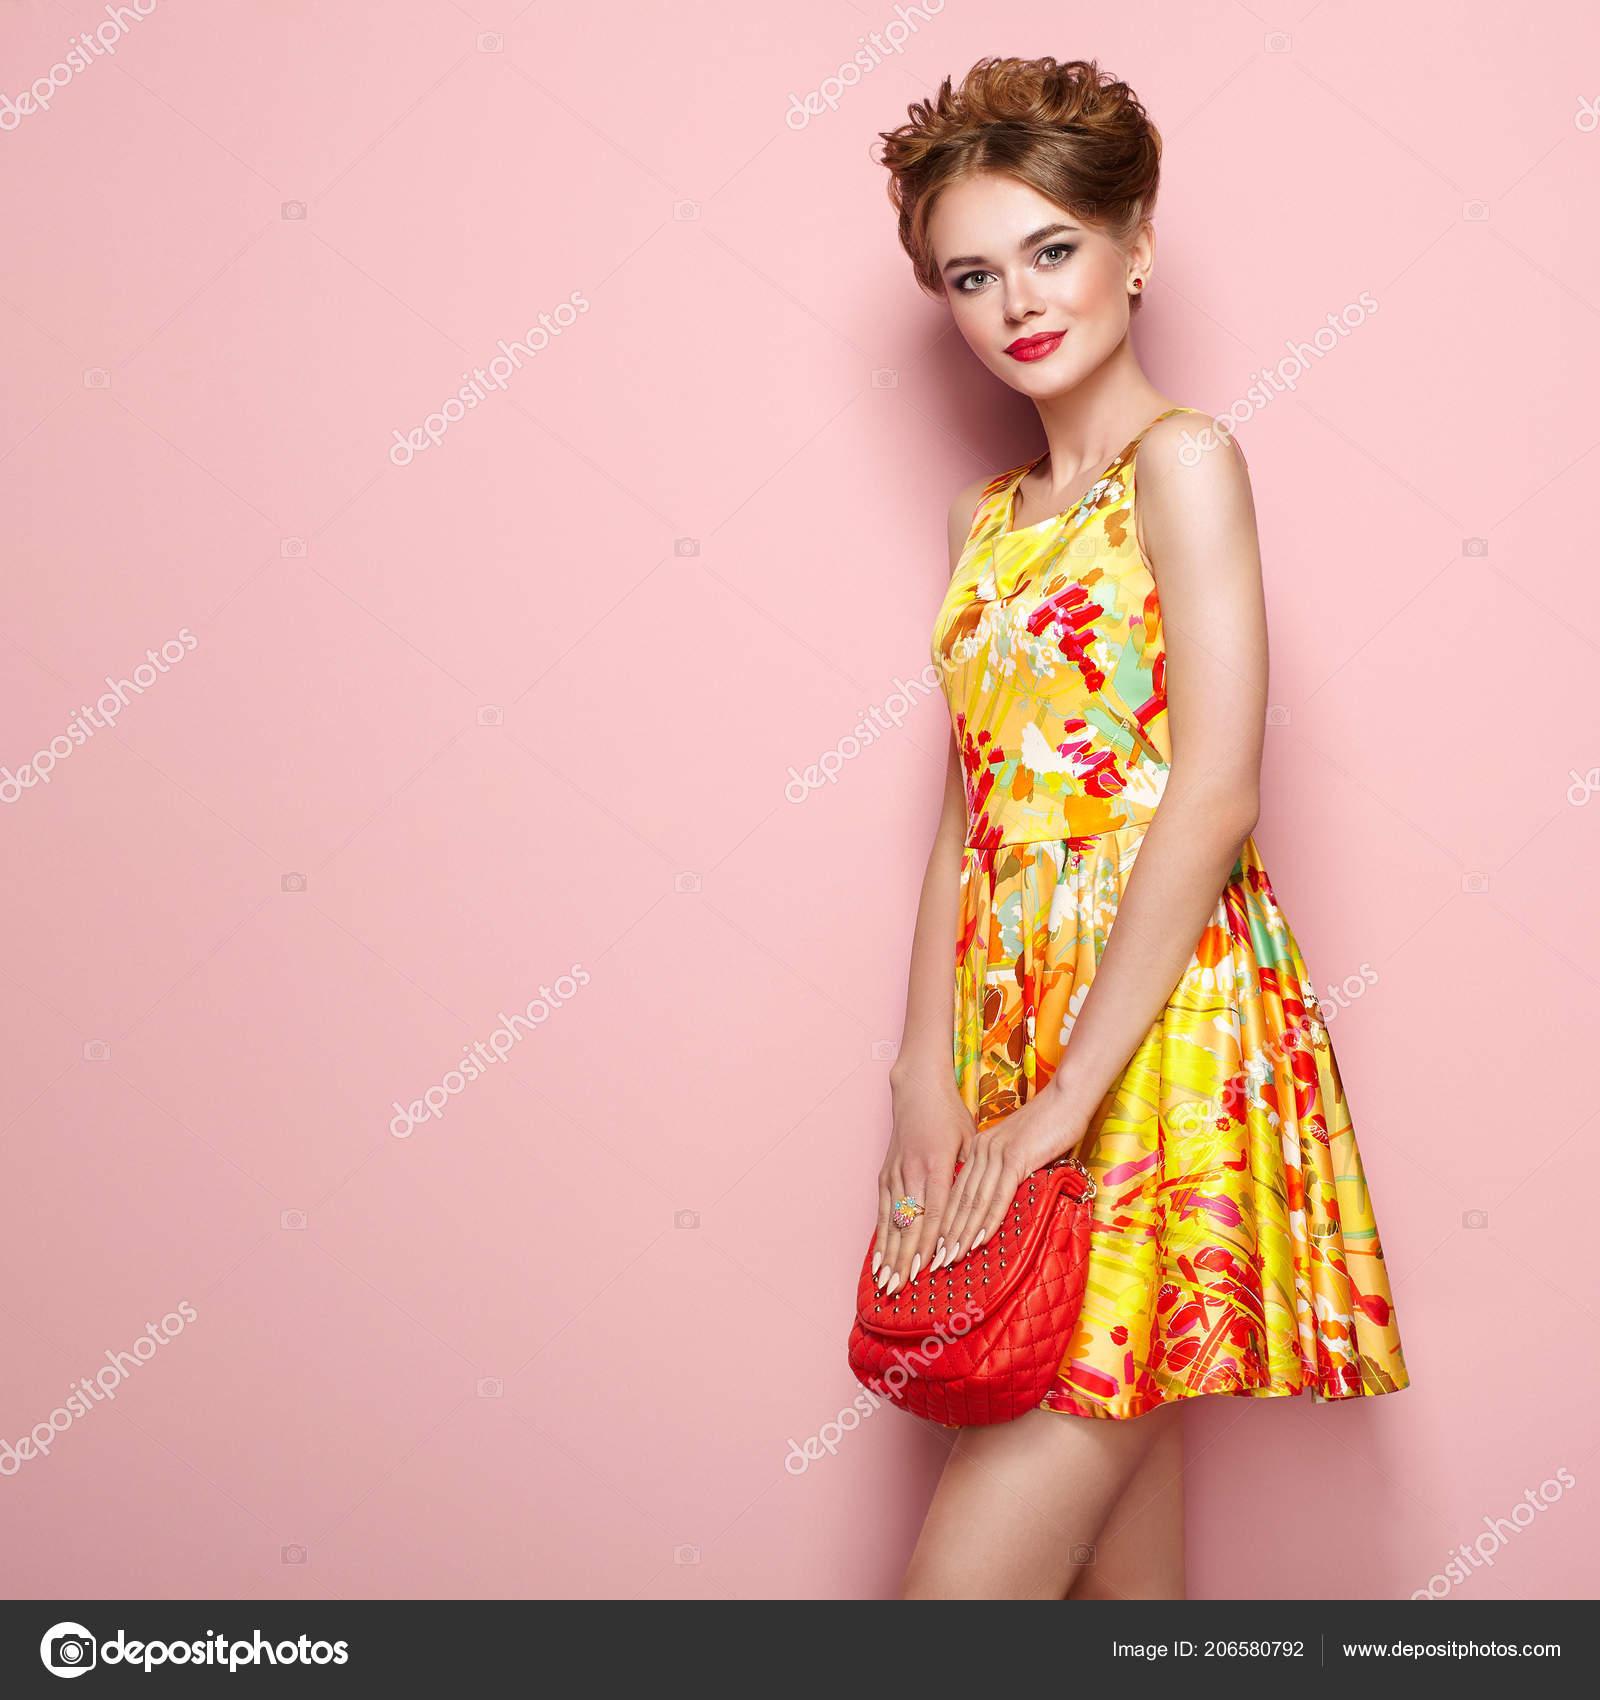 Portrait Mode Jeune Femme Robe Fleurs Modele Feminin Tenue Ete